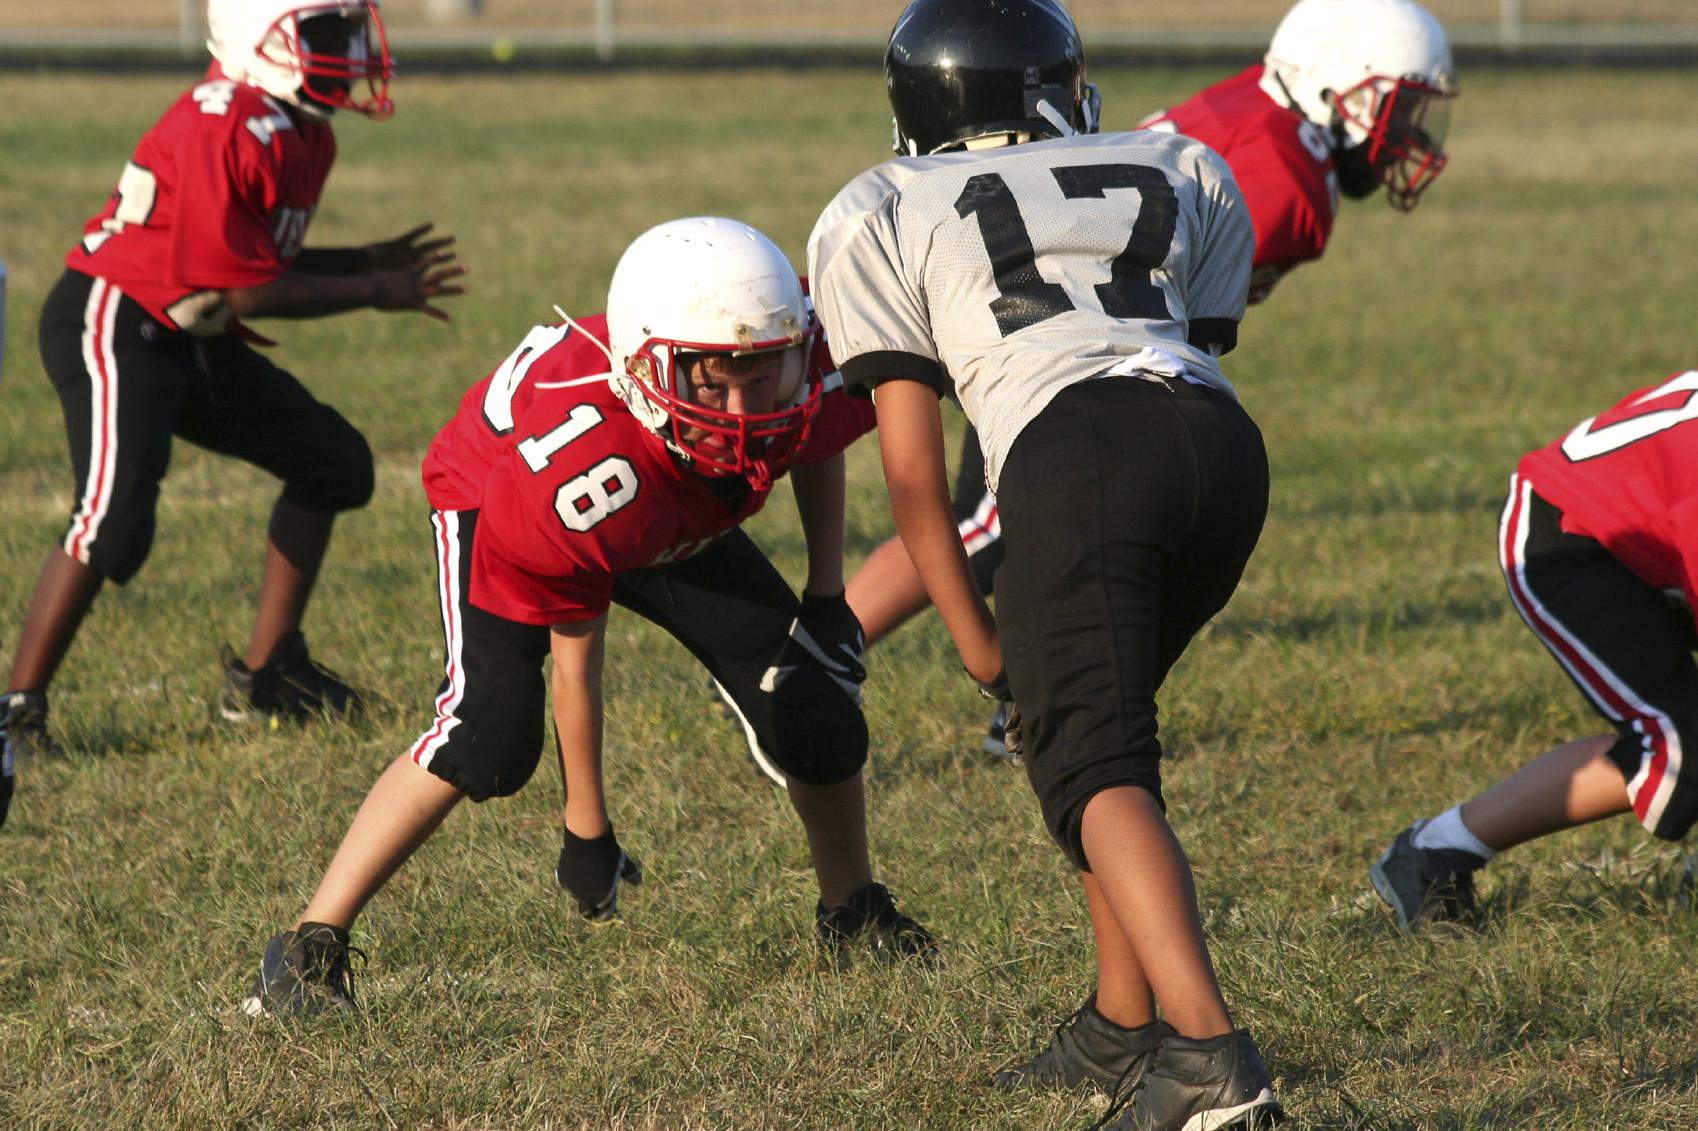 02-05-16-youth-football-blog